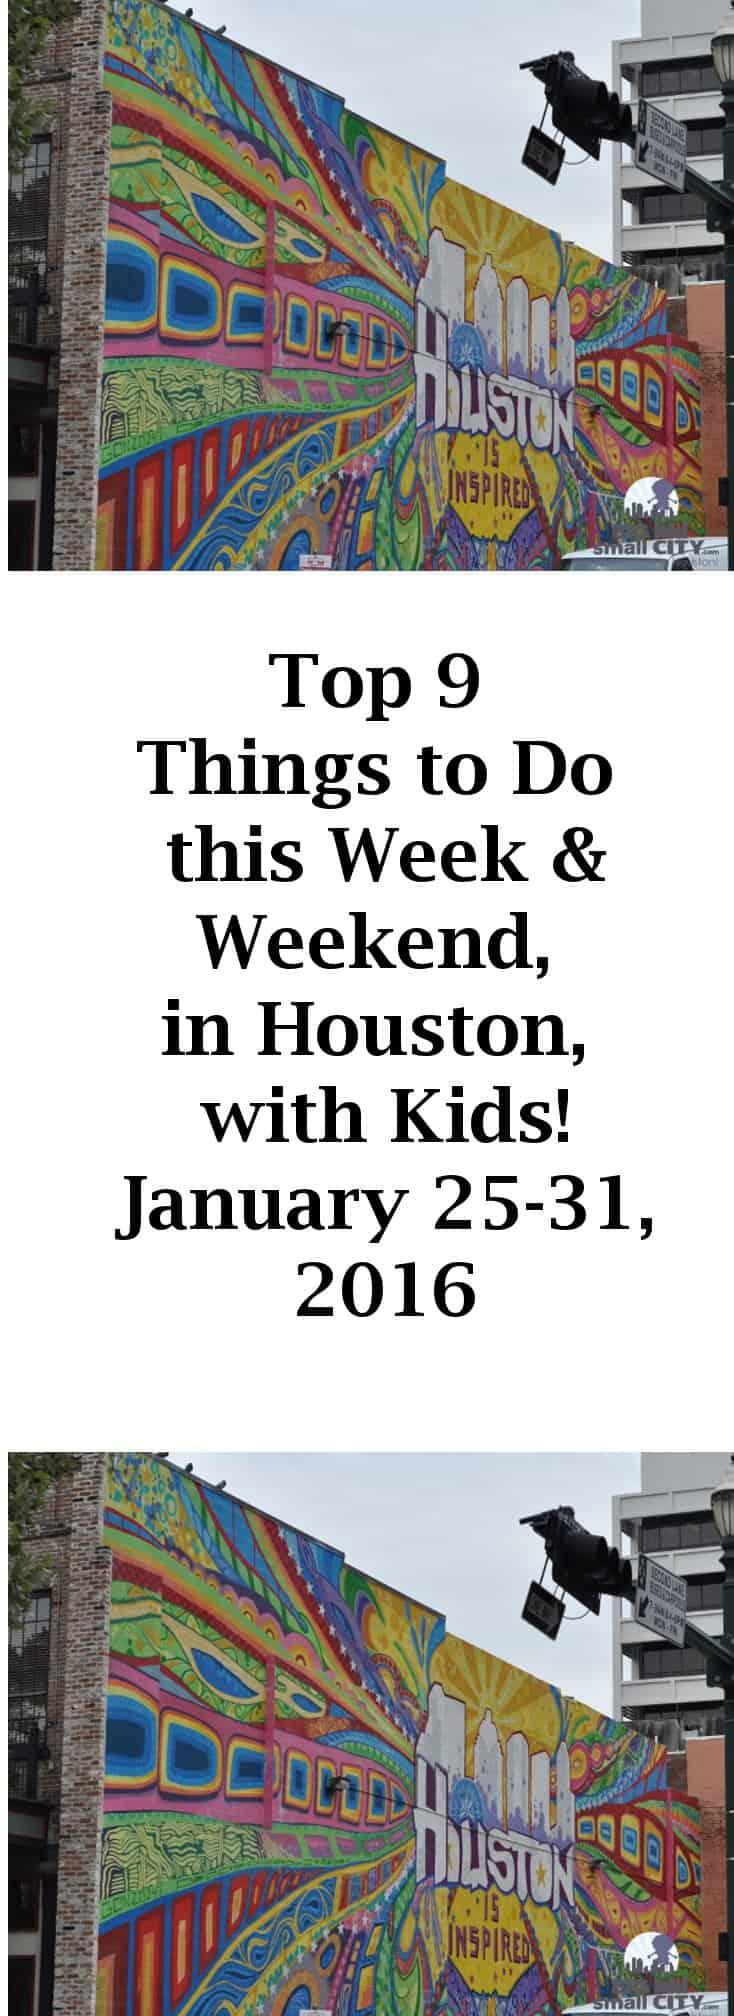 Top 9 January 25